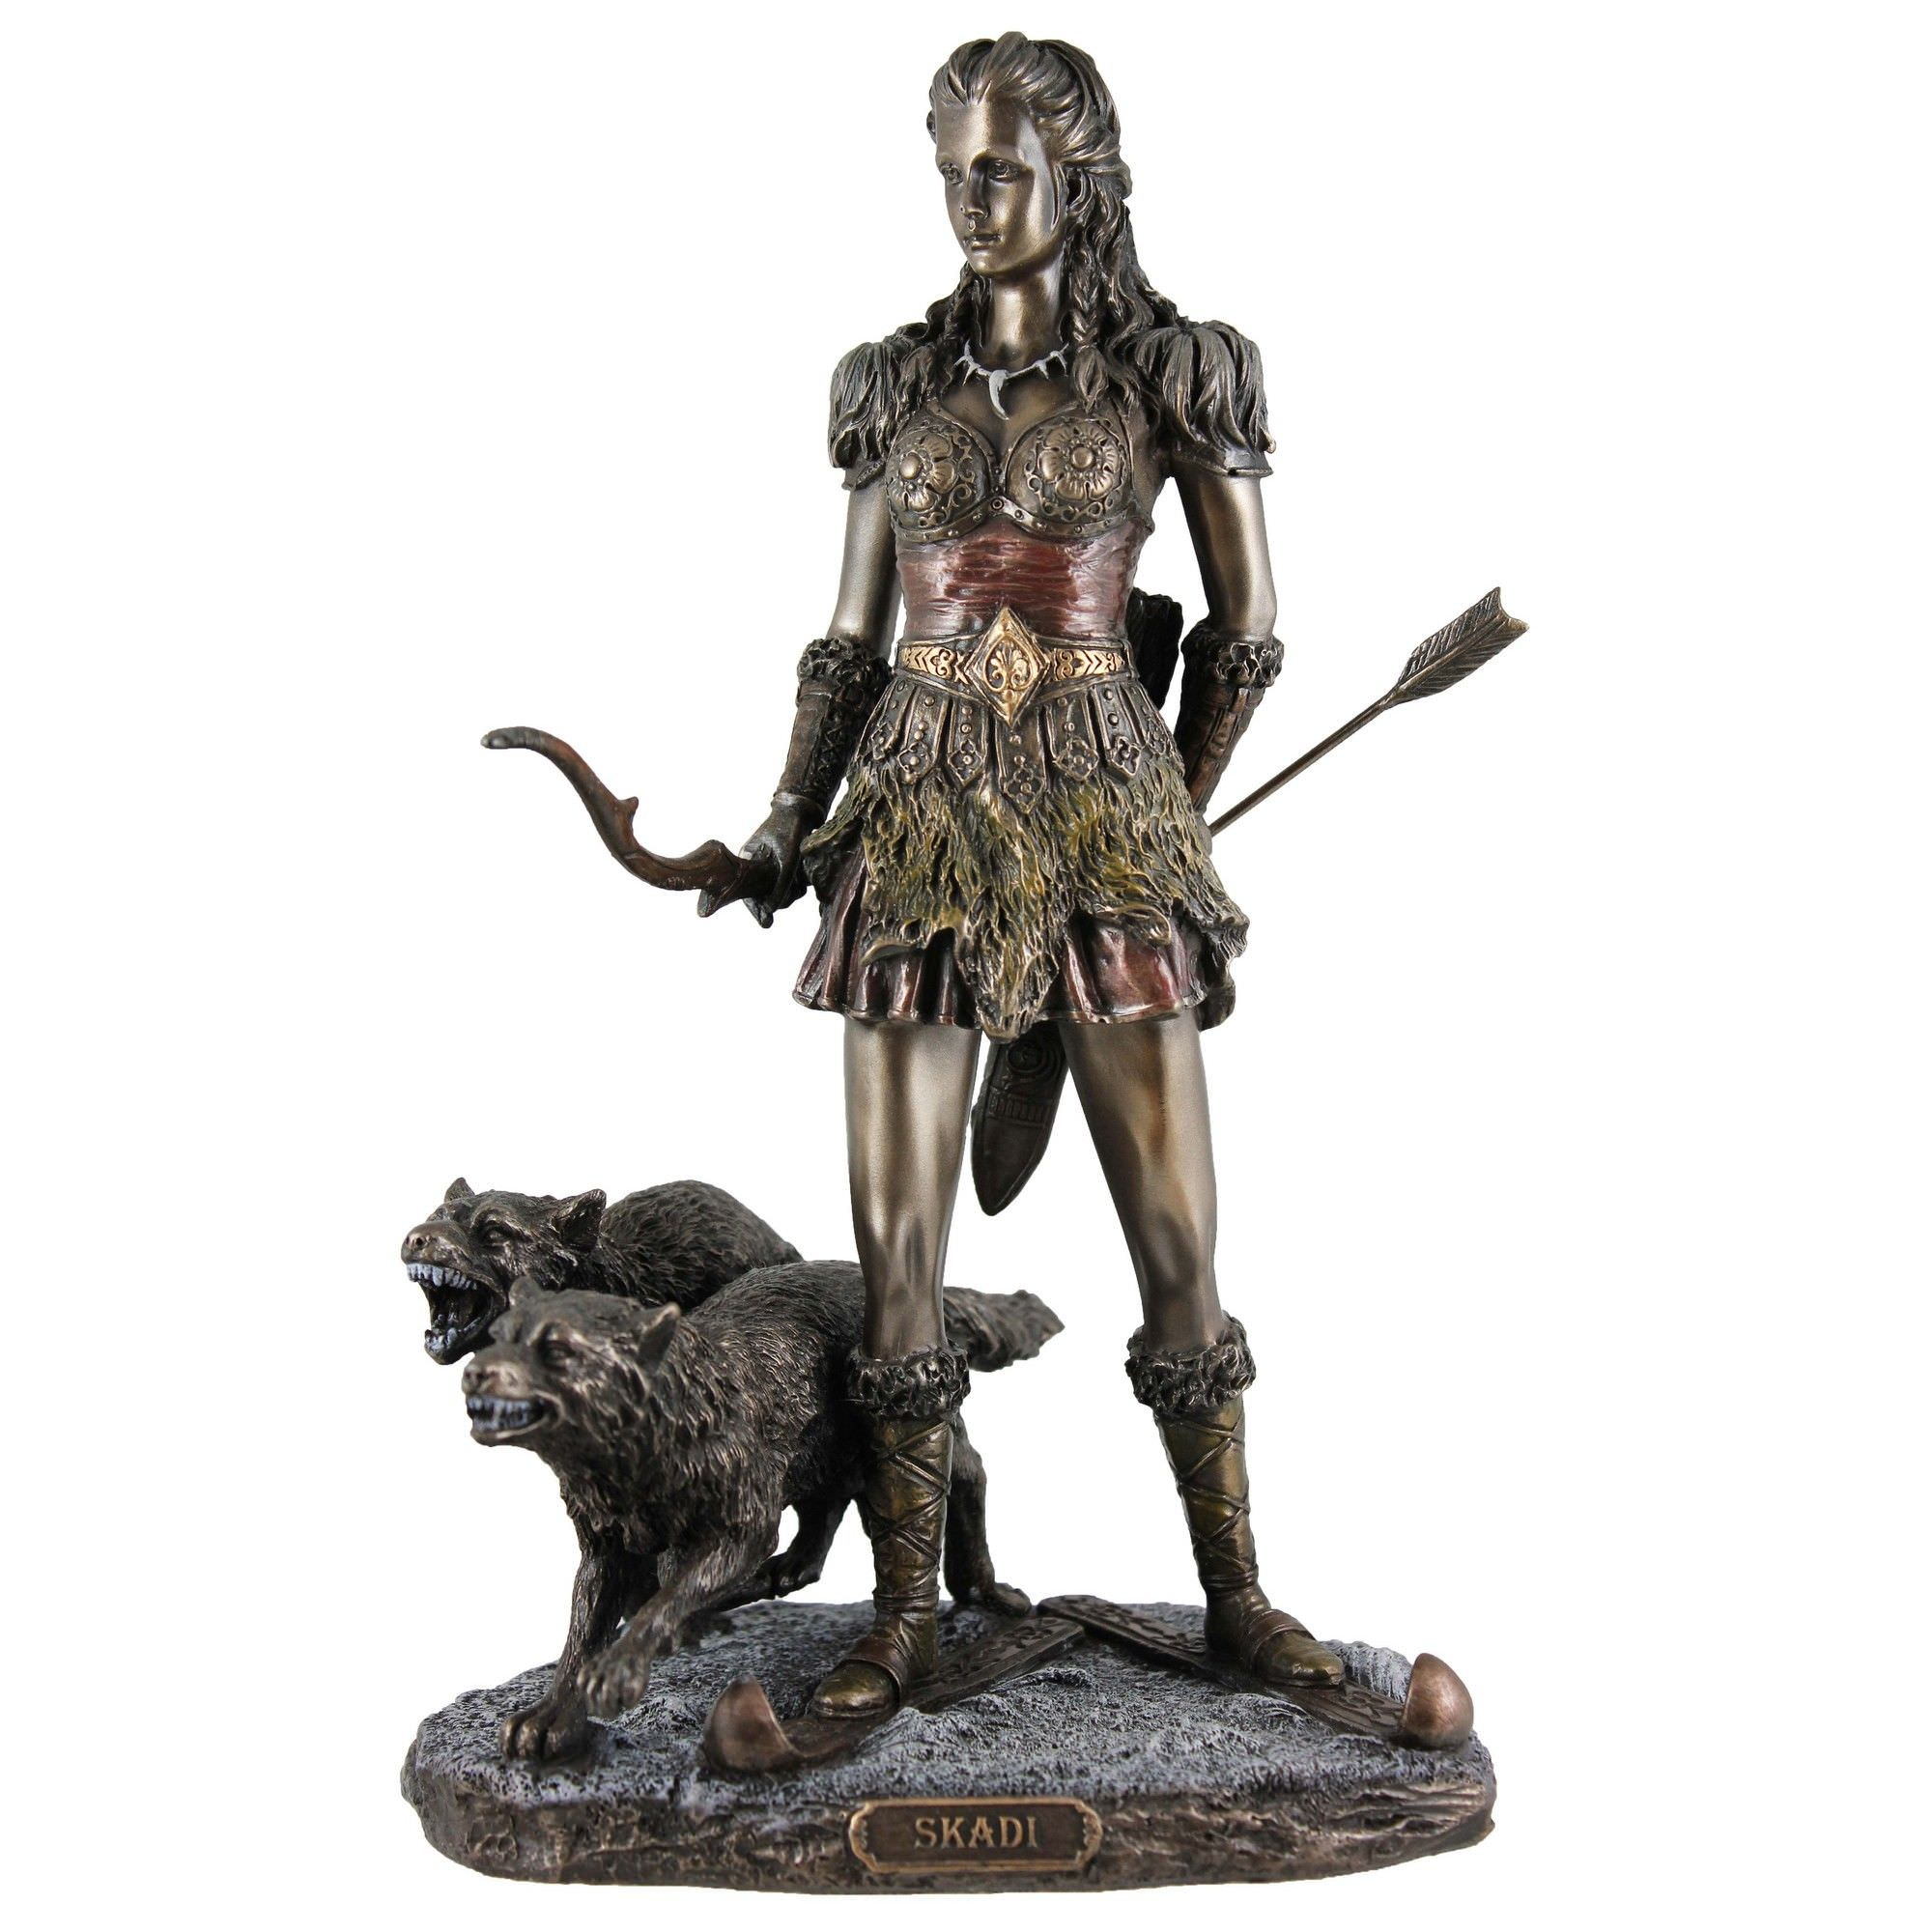 Veronese Cold Cast Bronze Coated Norse Mythology Figurine, Skadi - Goddess of Winter